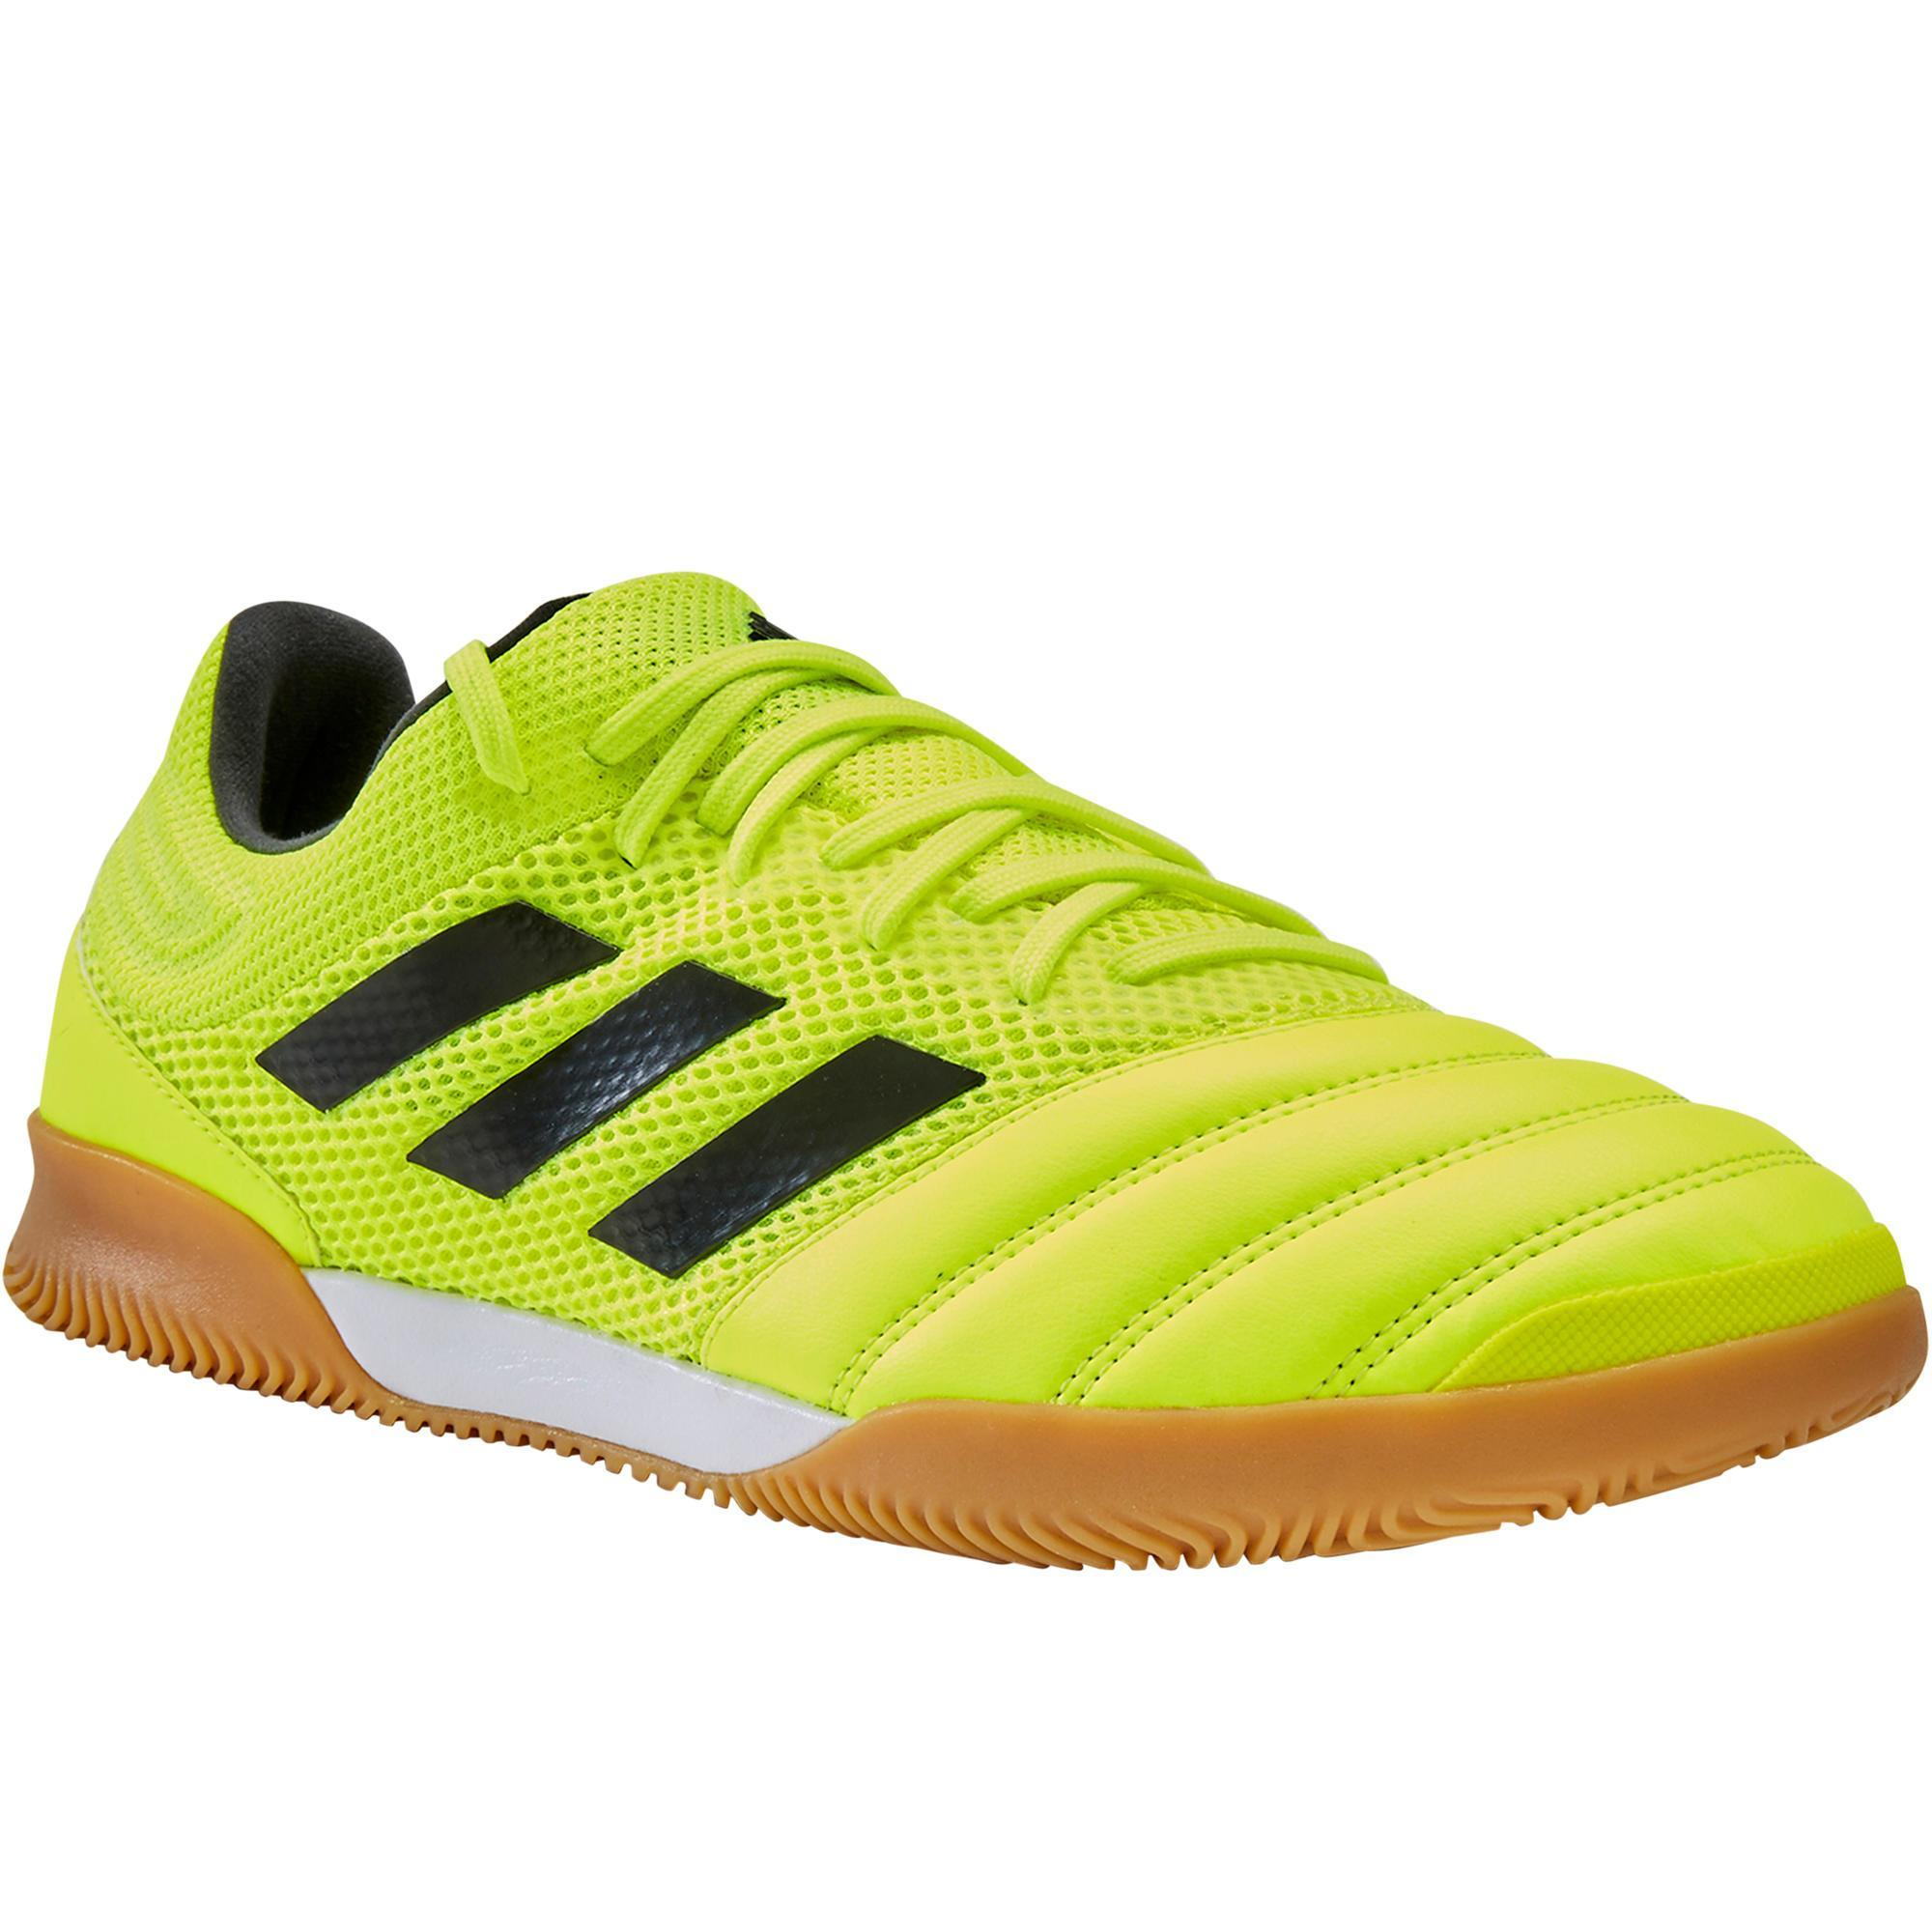 Copa Futsal Trainers - Yellow/Black